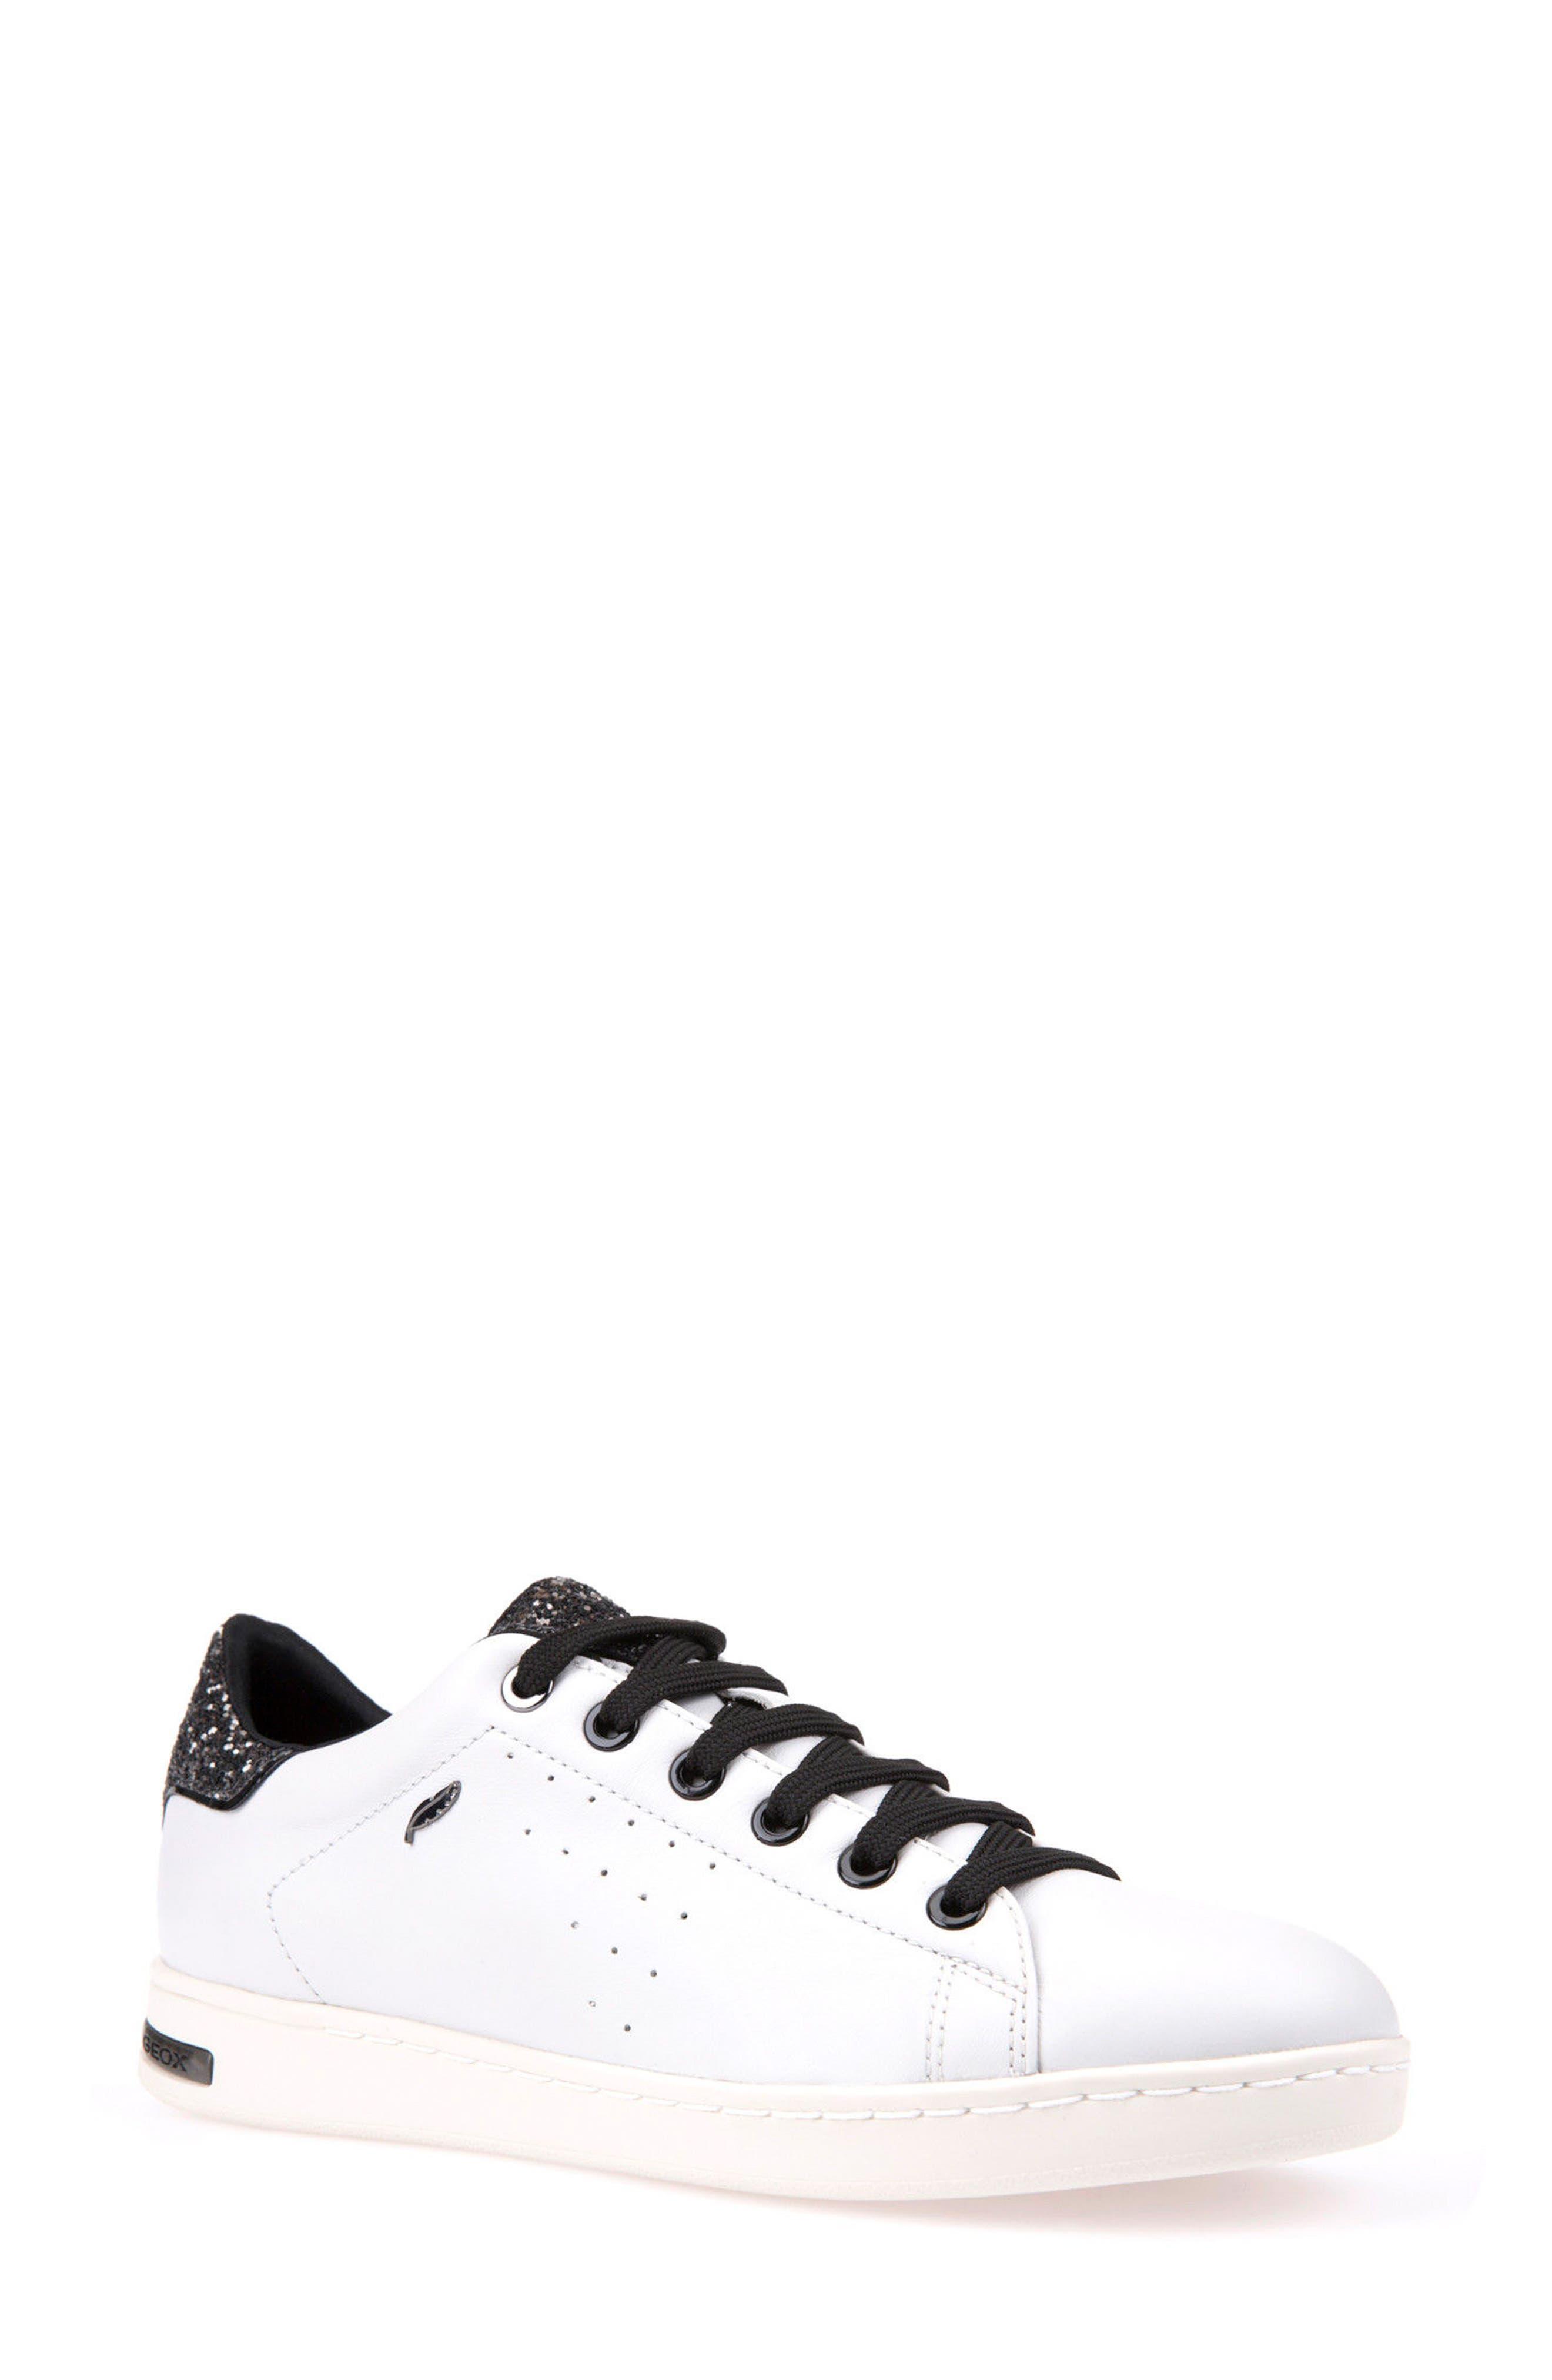 'Jaysen' Sneaker,                             Main thumbnail 1, color,                             White/ Silver Leather